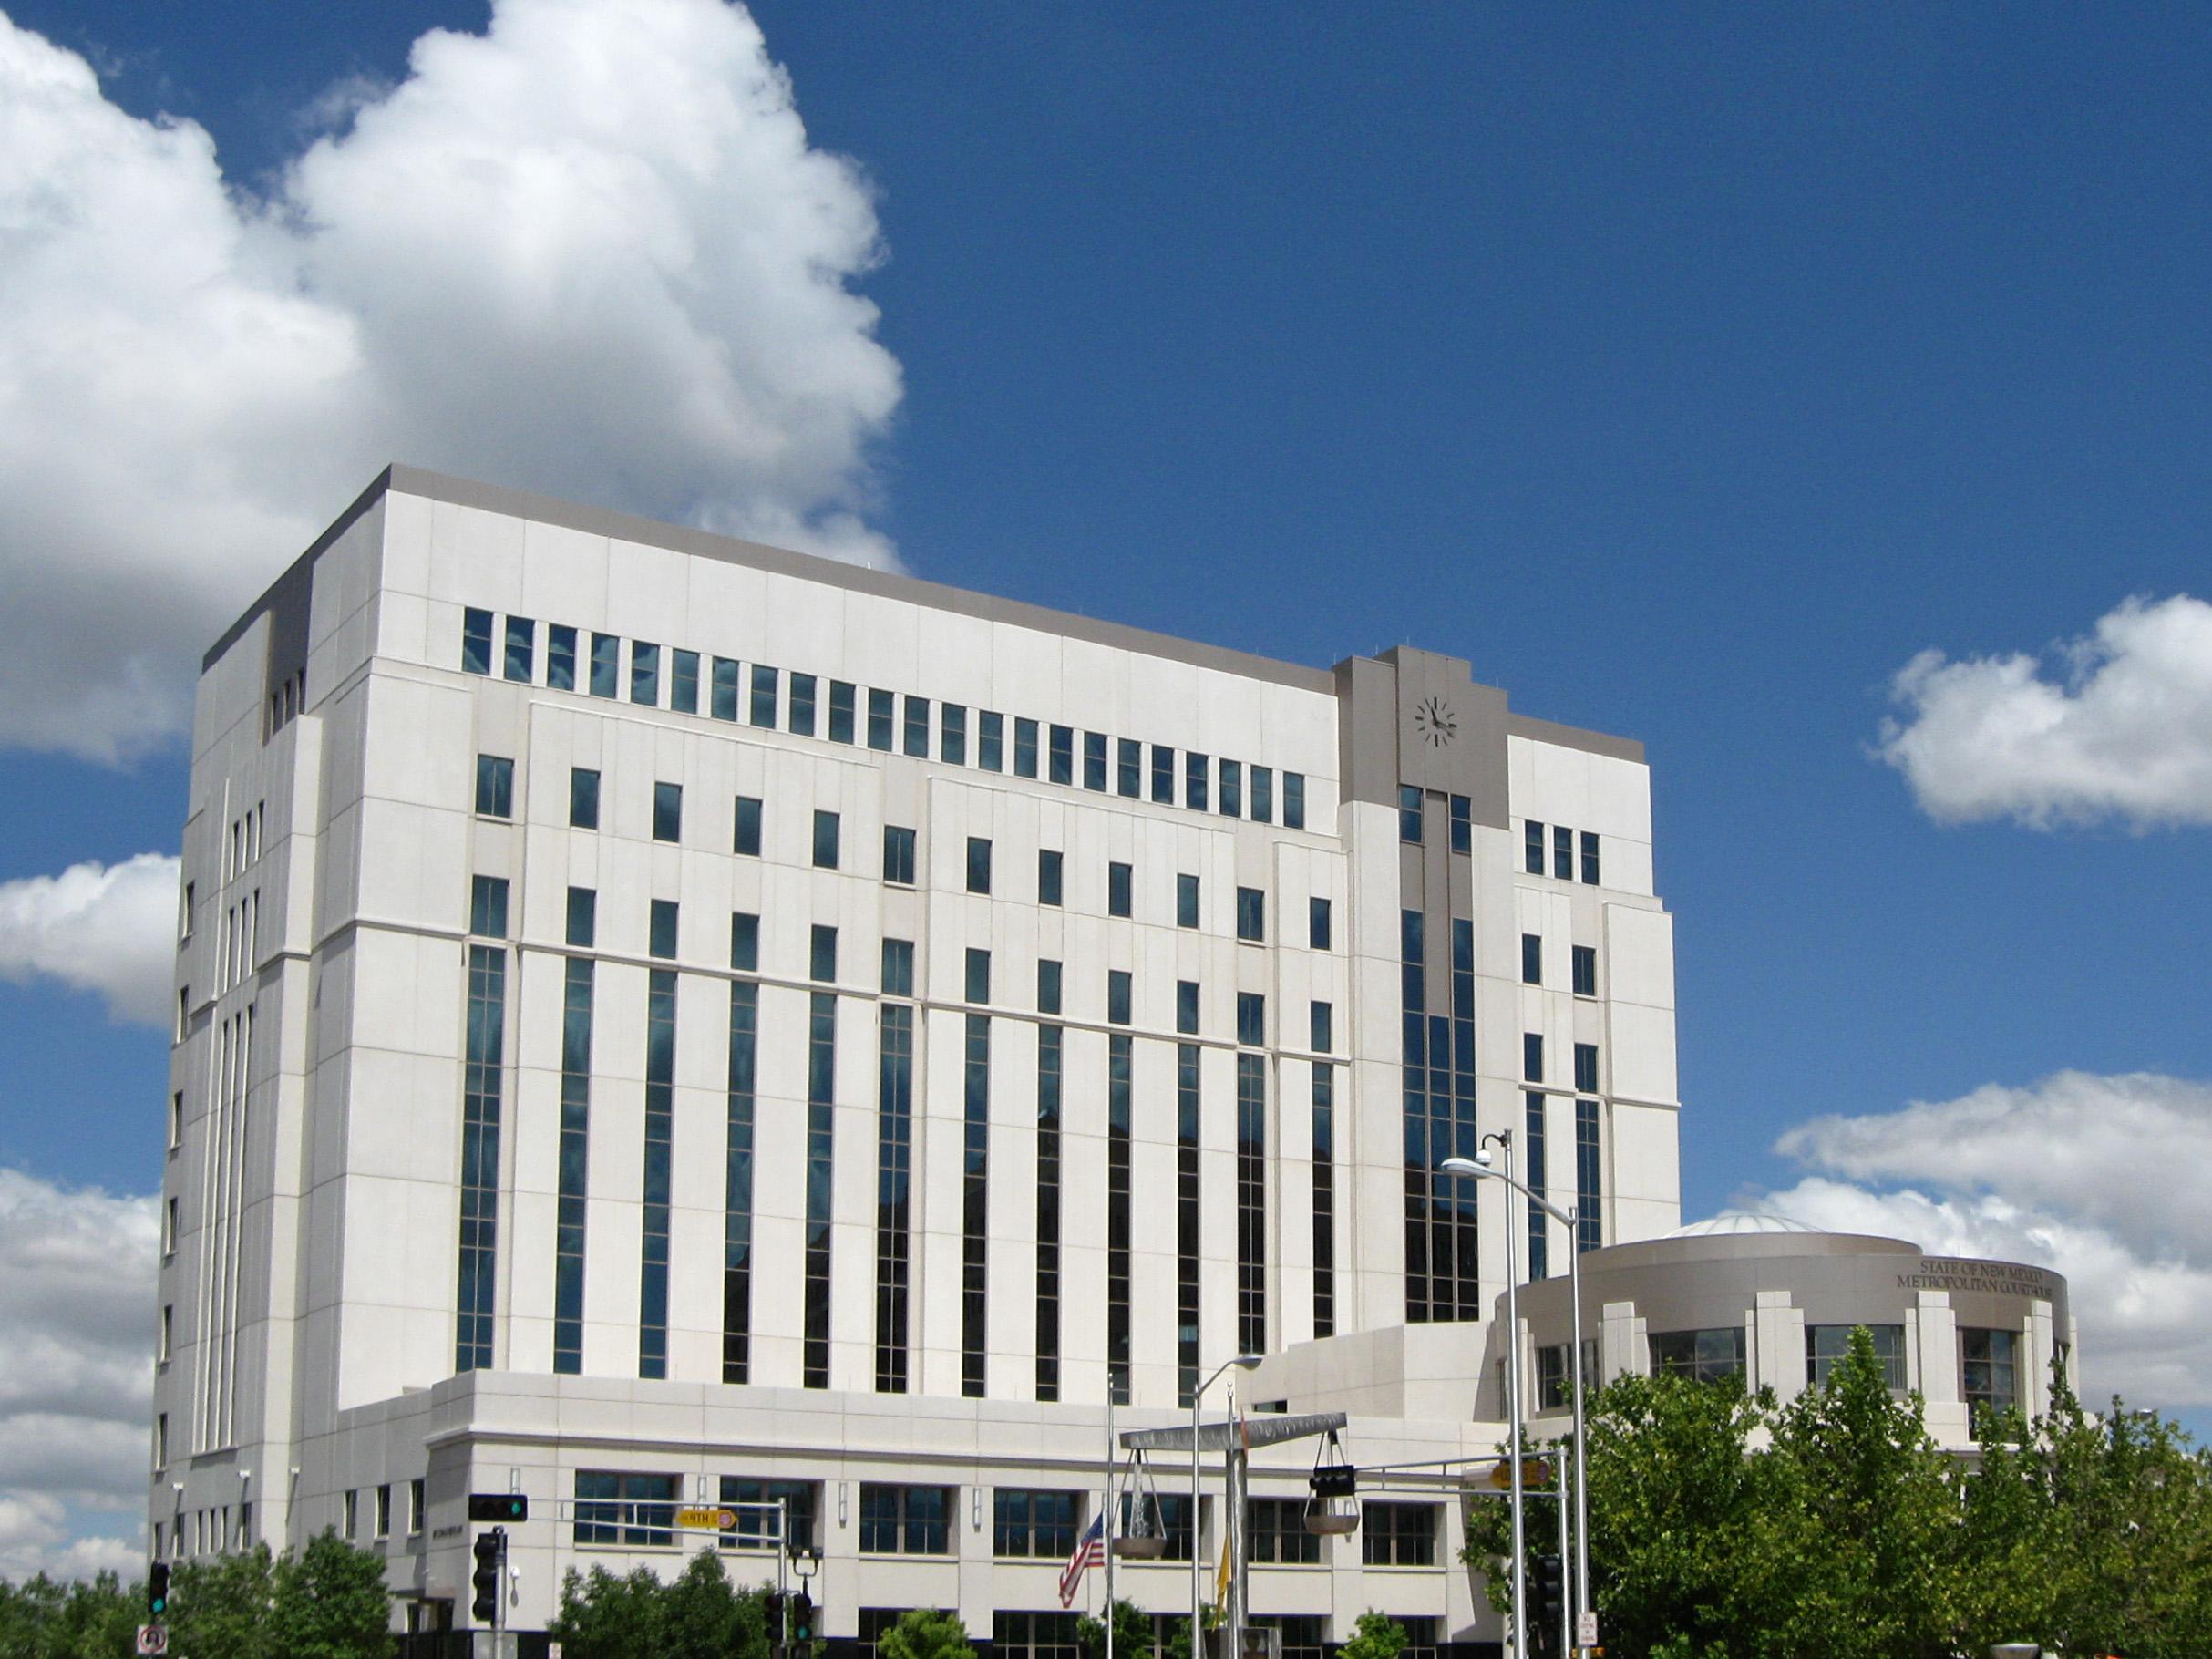 Albuquerque Workers' Compensation Attorney